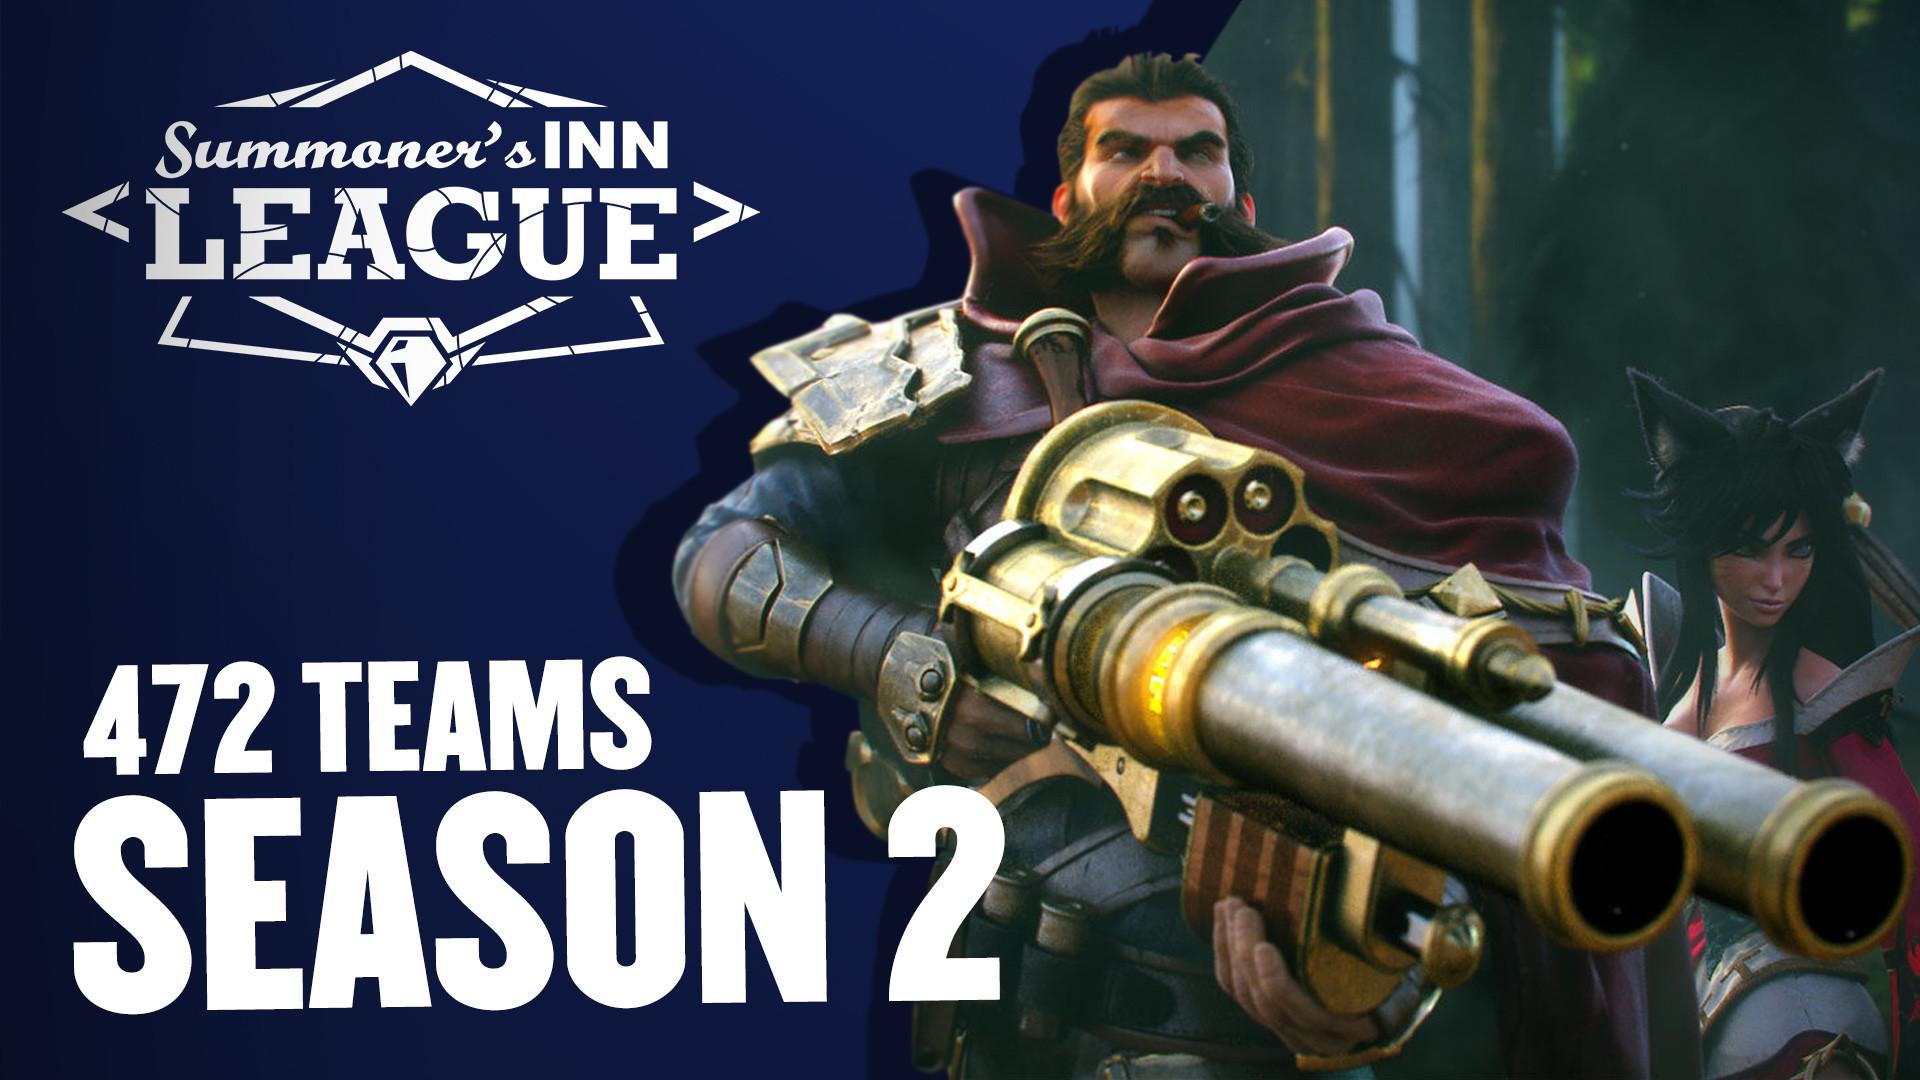 Die SINN League startet mit 472 Teams in Season 2!